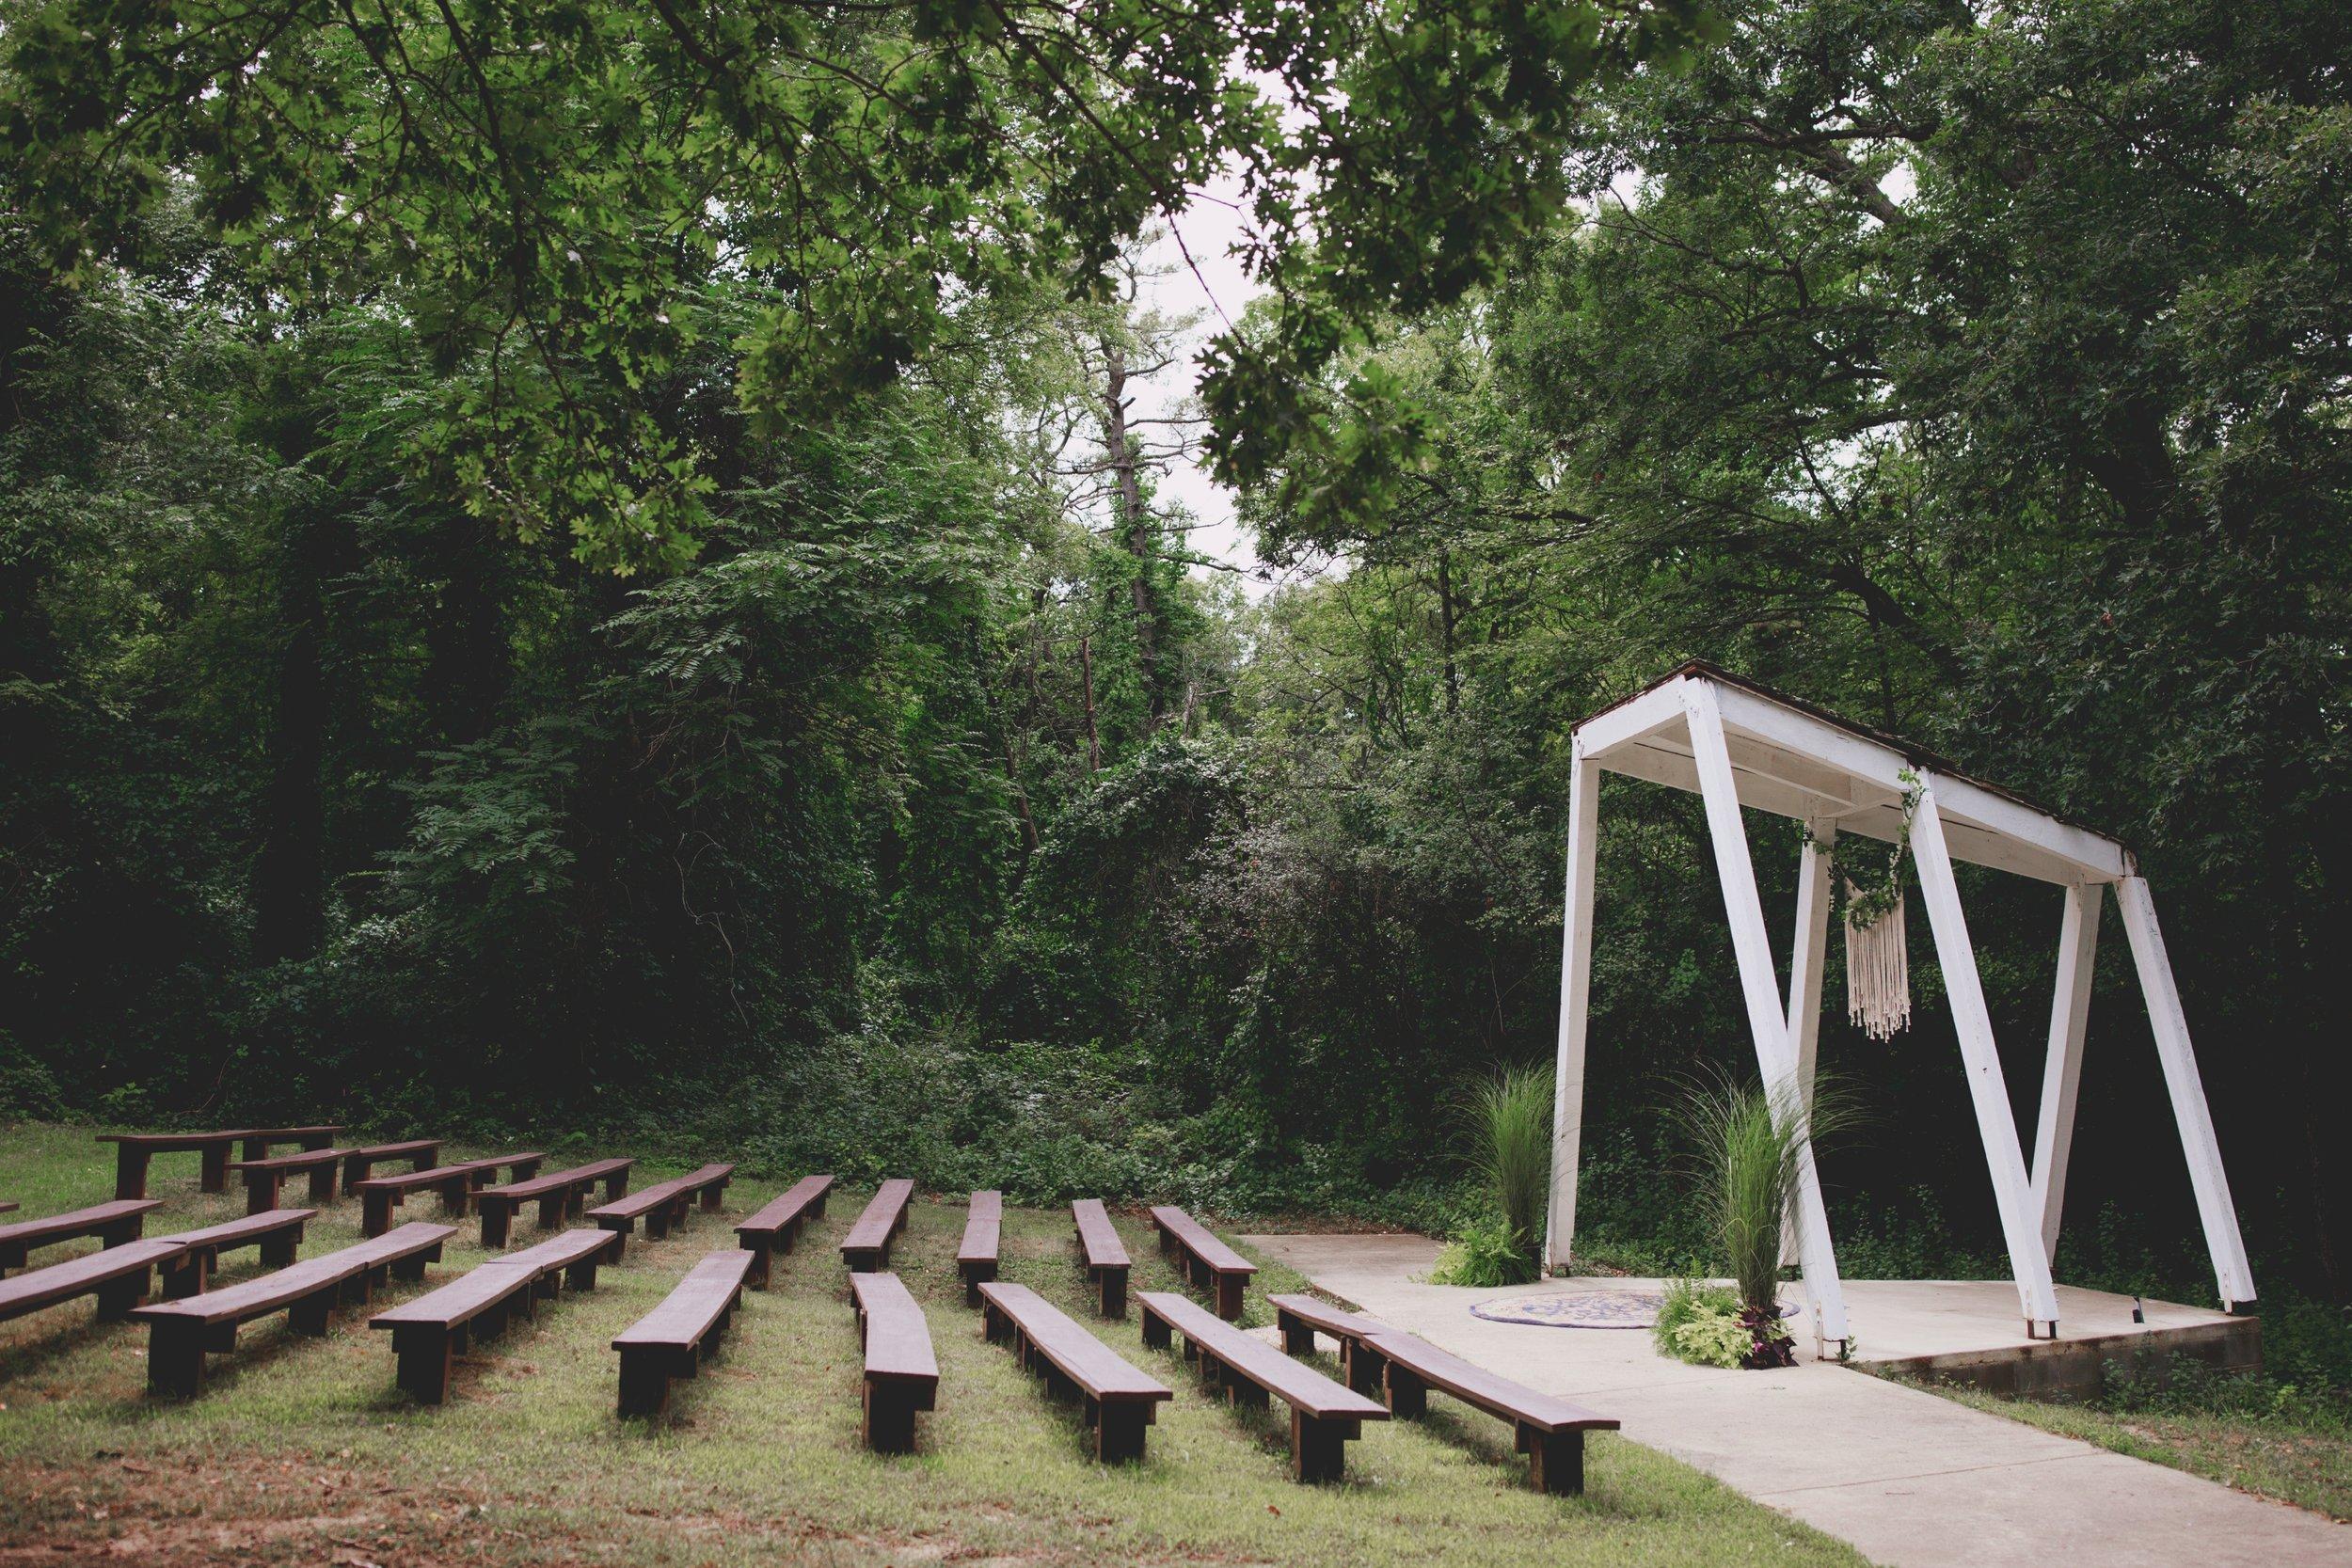 amanda_vanvels_michigan_camp_wedding_017.jpg